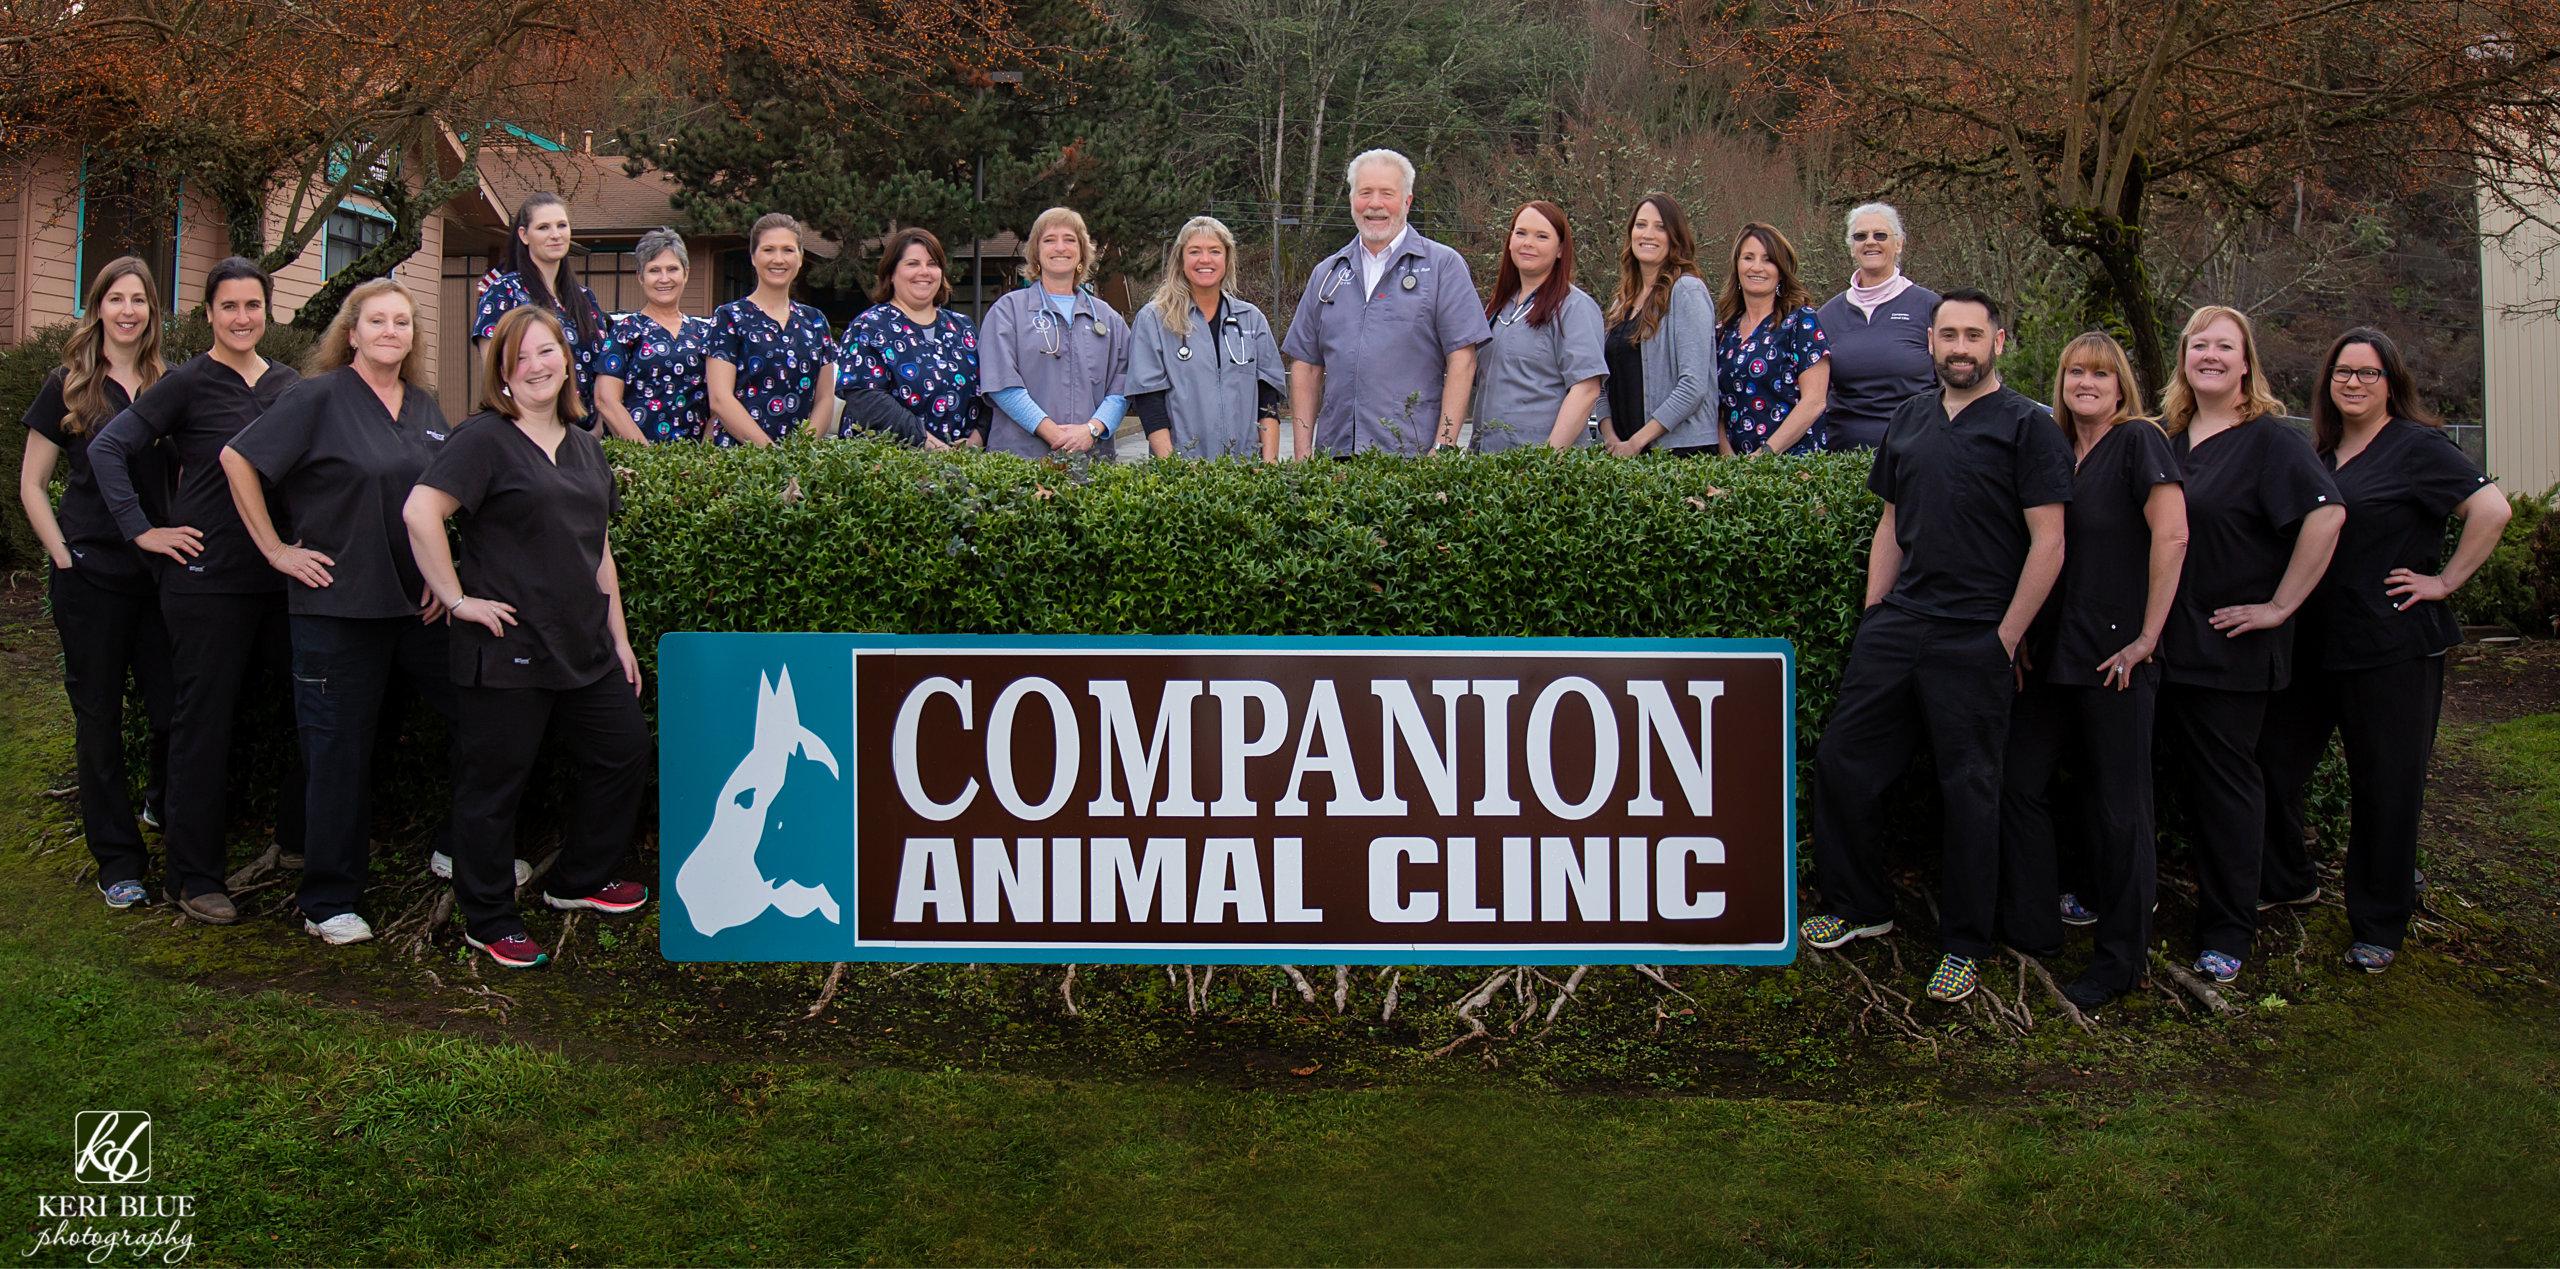 Companion Group Photo